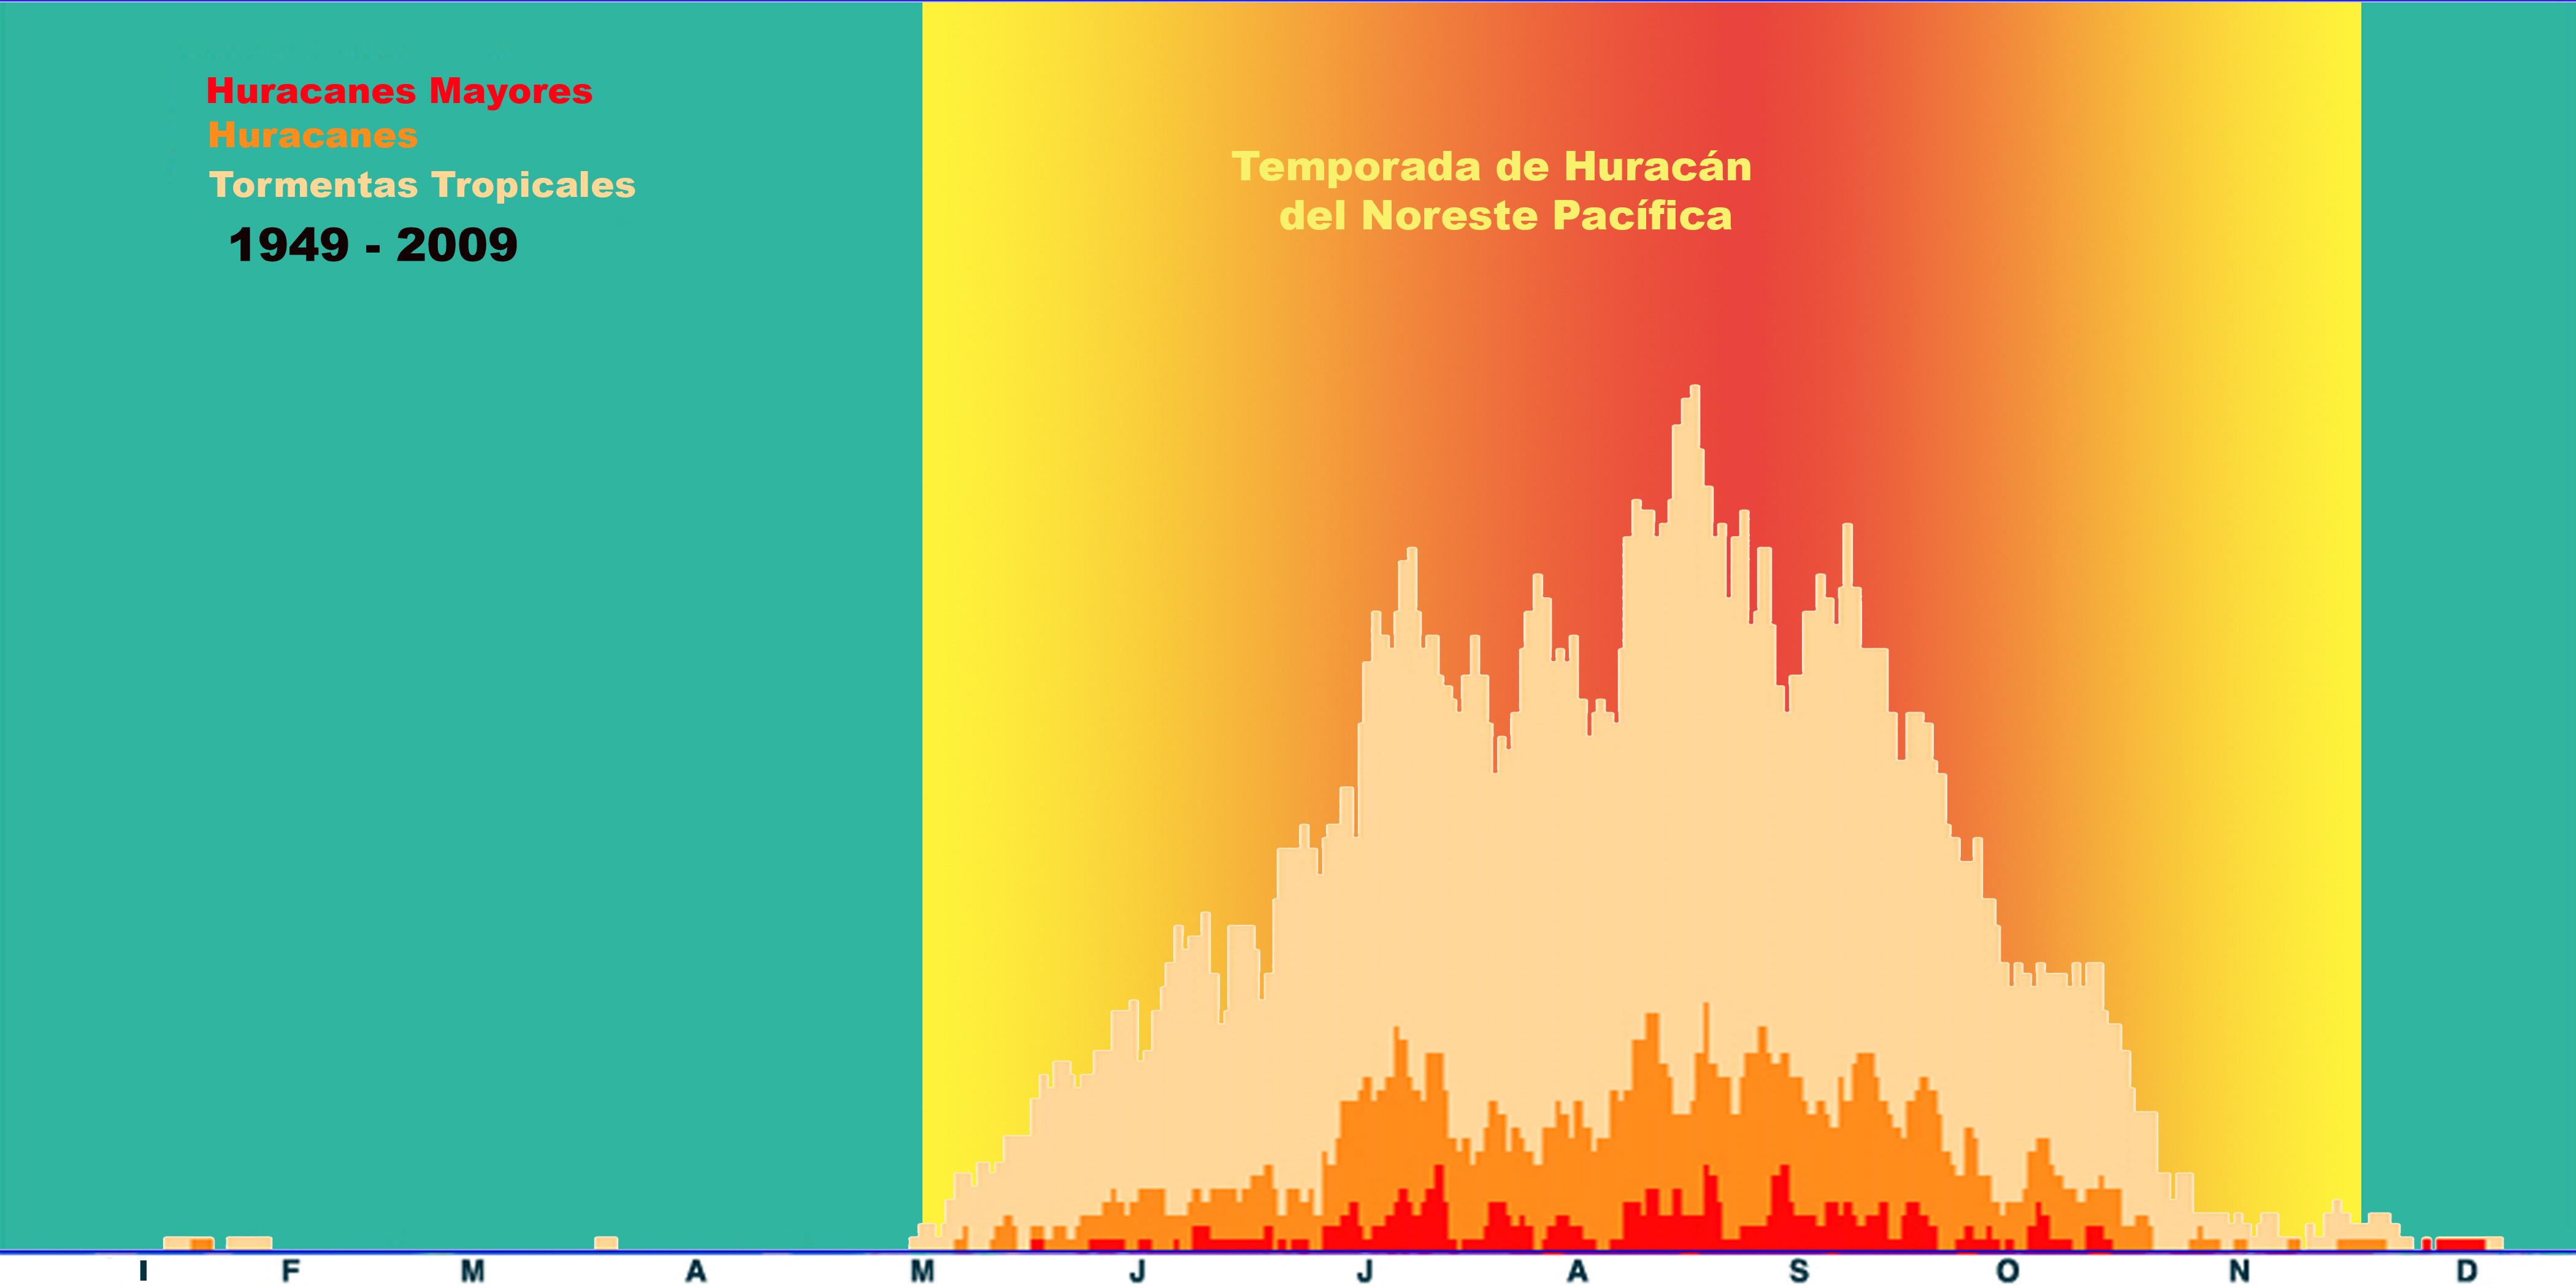 Temporada de huracanes del Noreste Pacífica. Período 1949-2009.